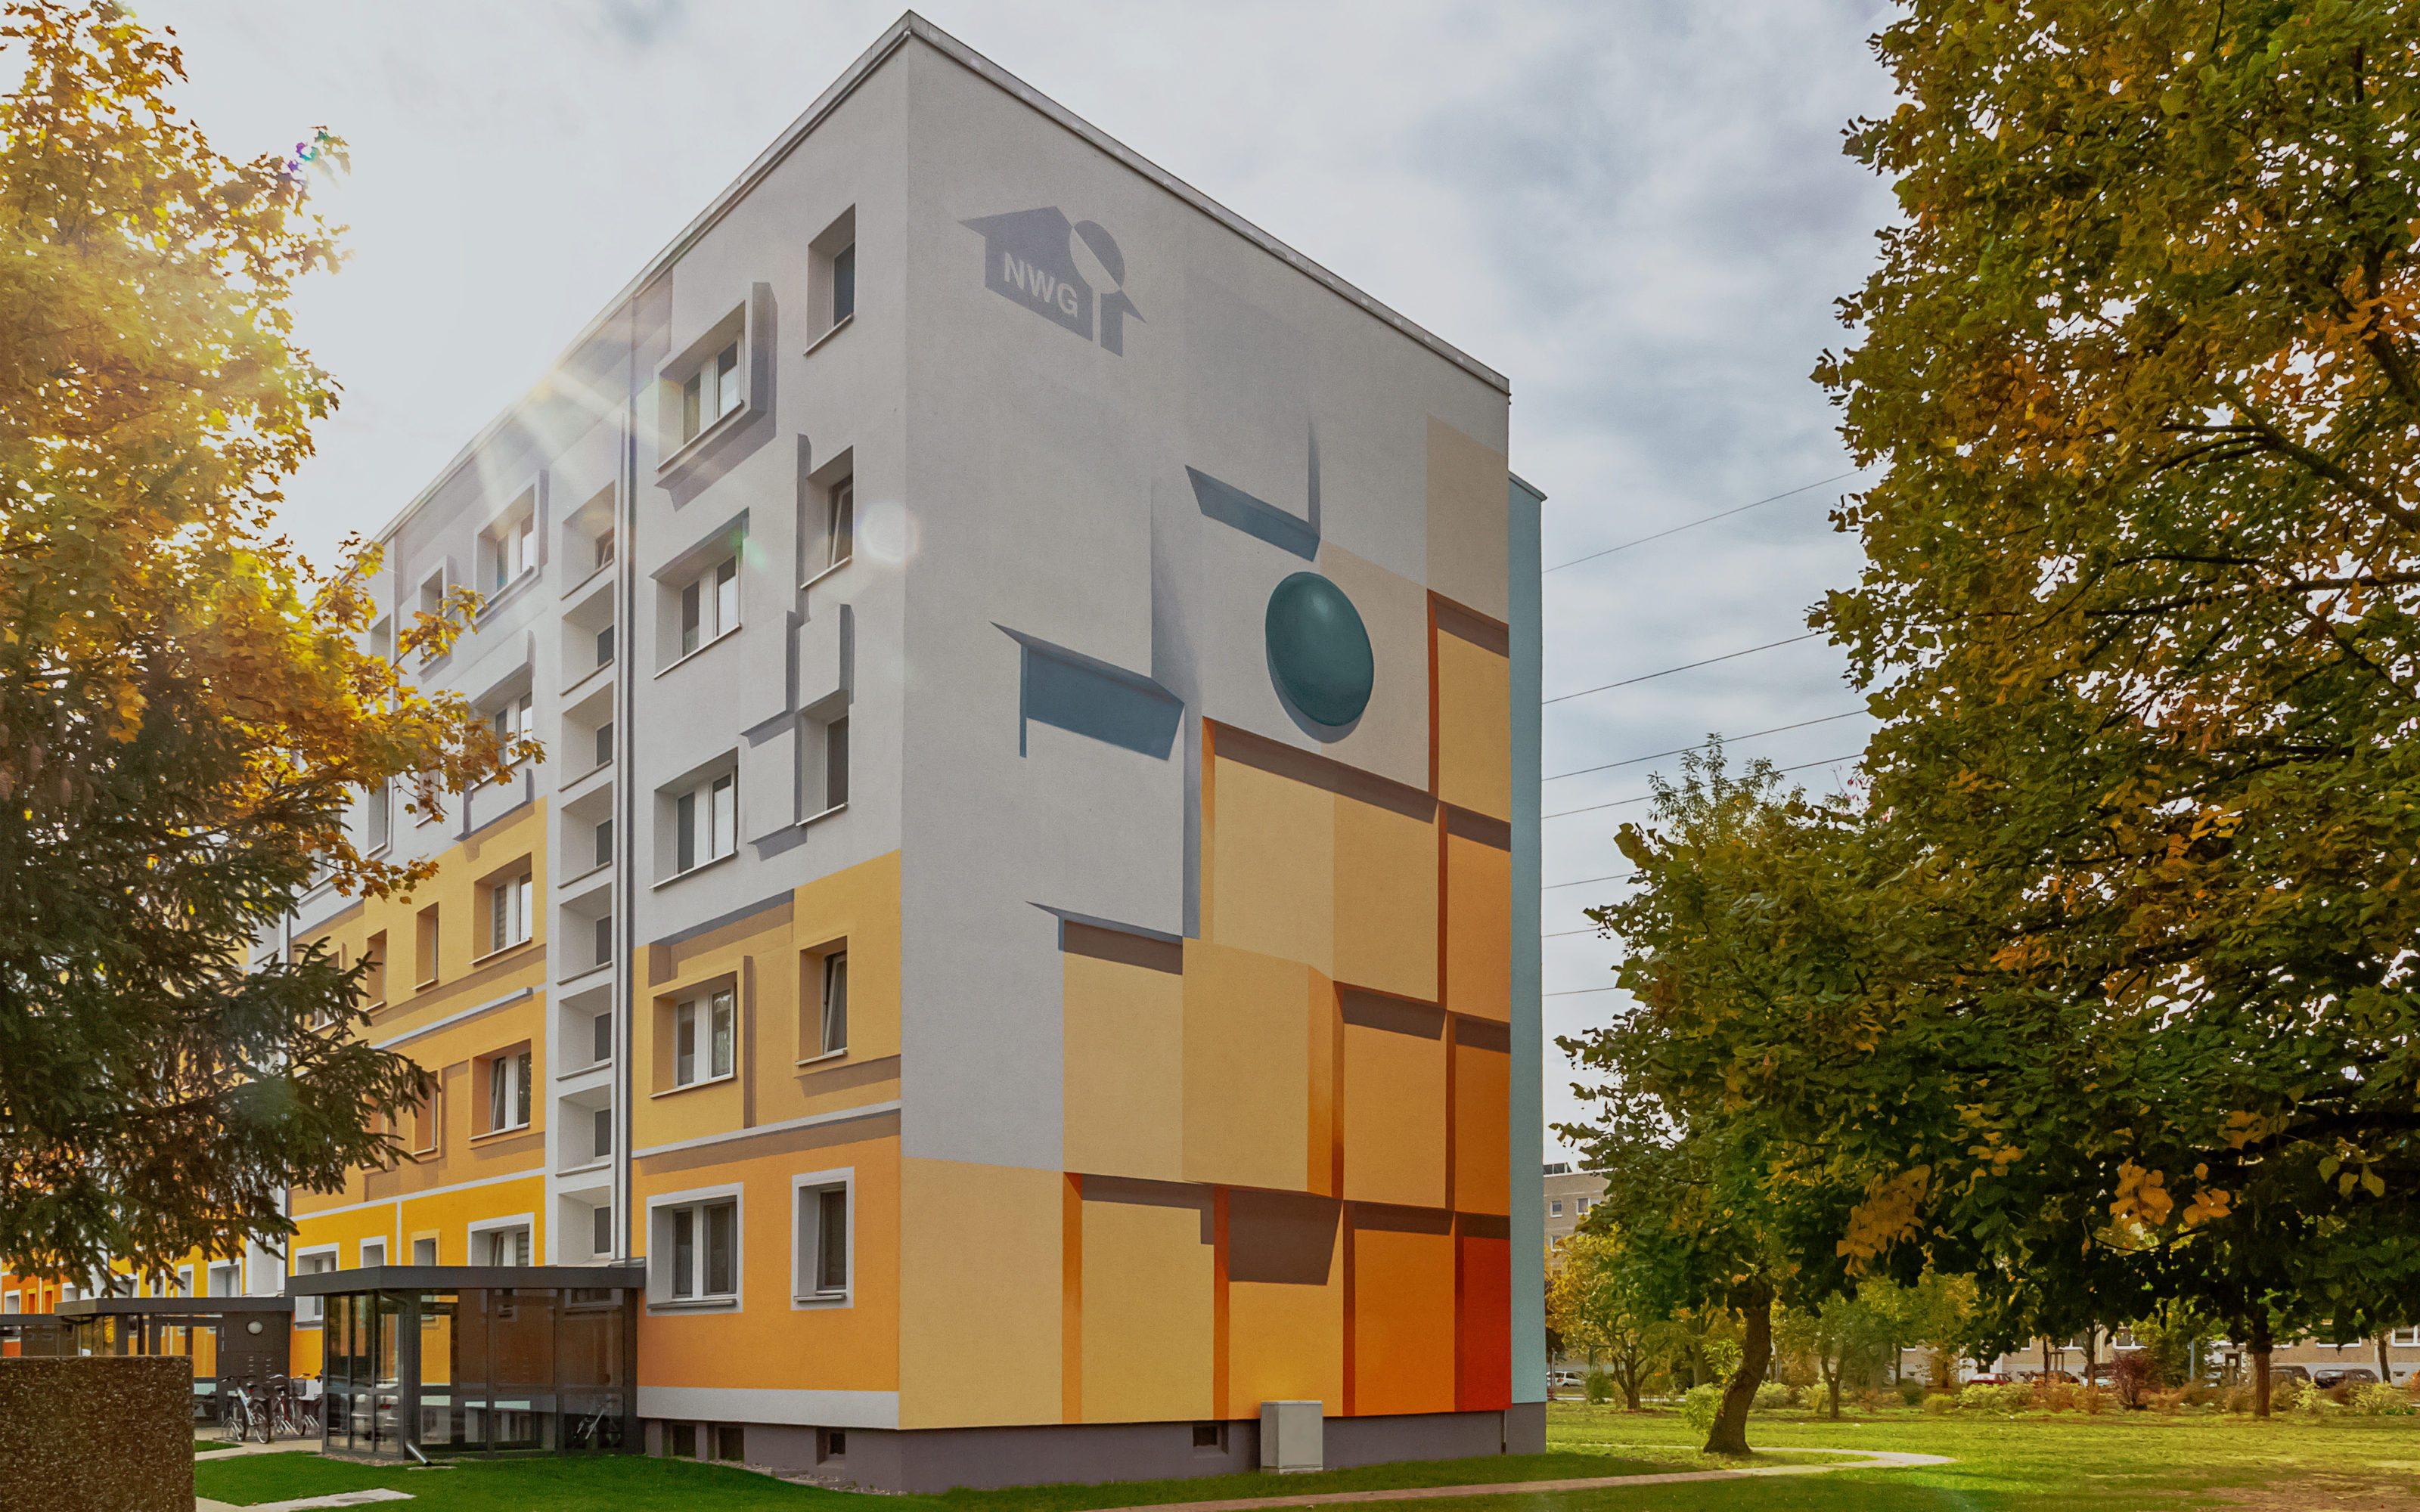 GRACO-Neuruppin-Fassadenmalerei-Projekt